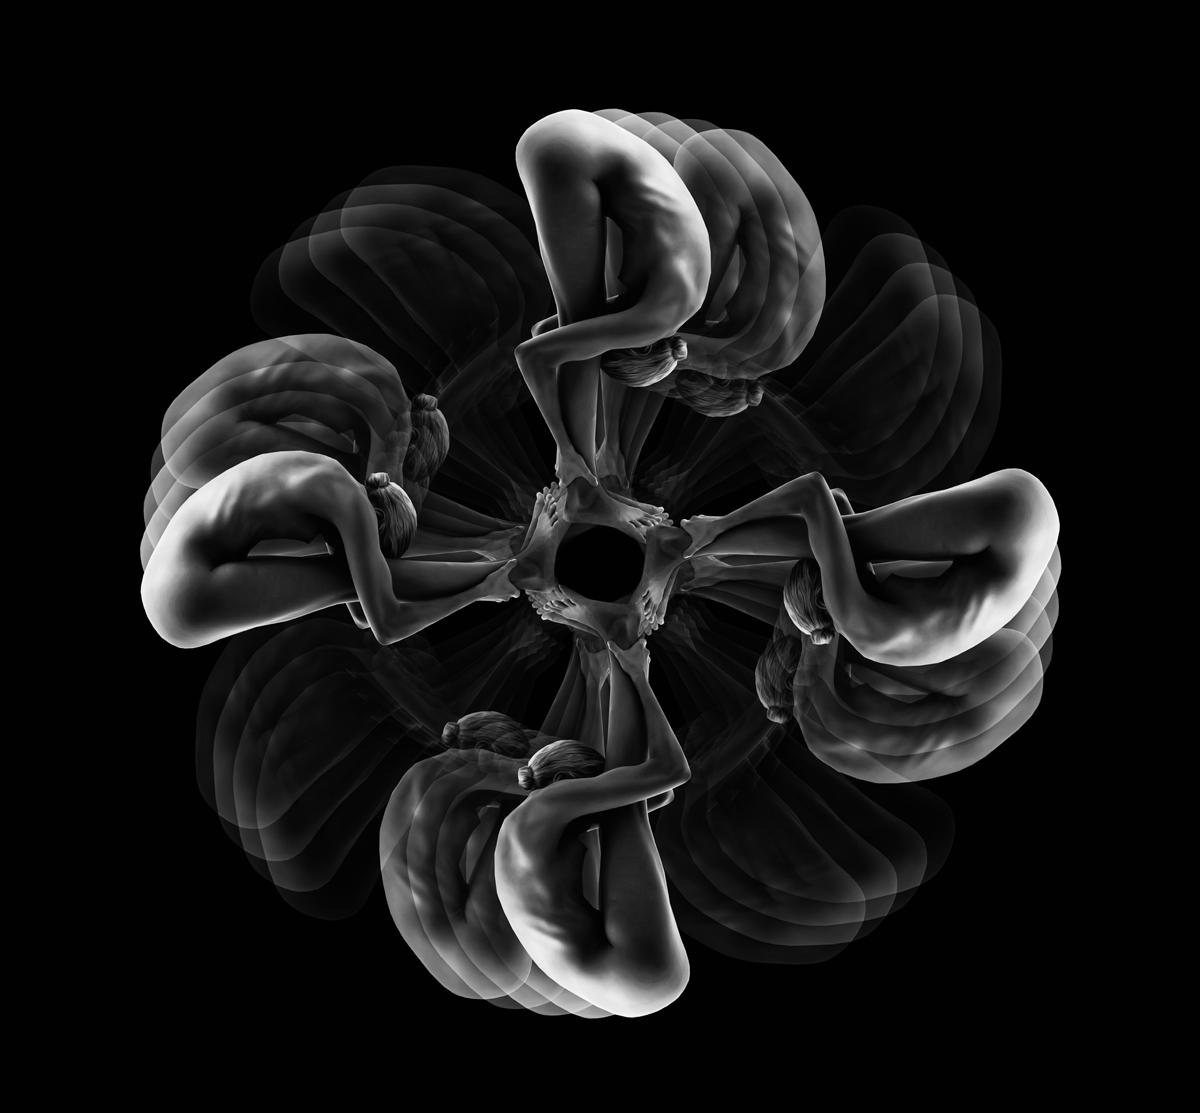 emel-karakozak-budding-nudes-abstract-photographer-16